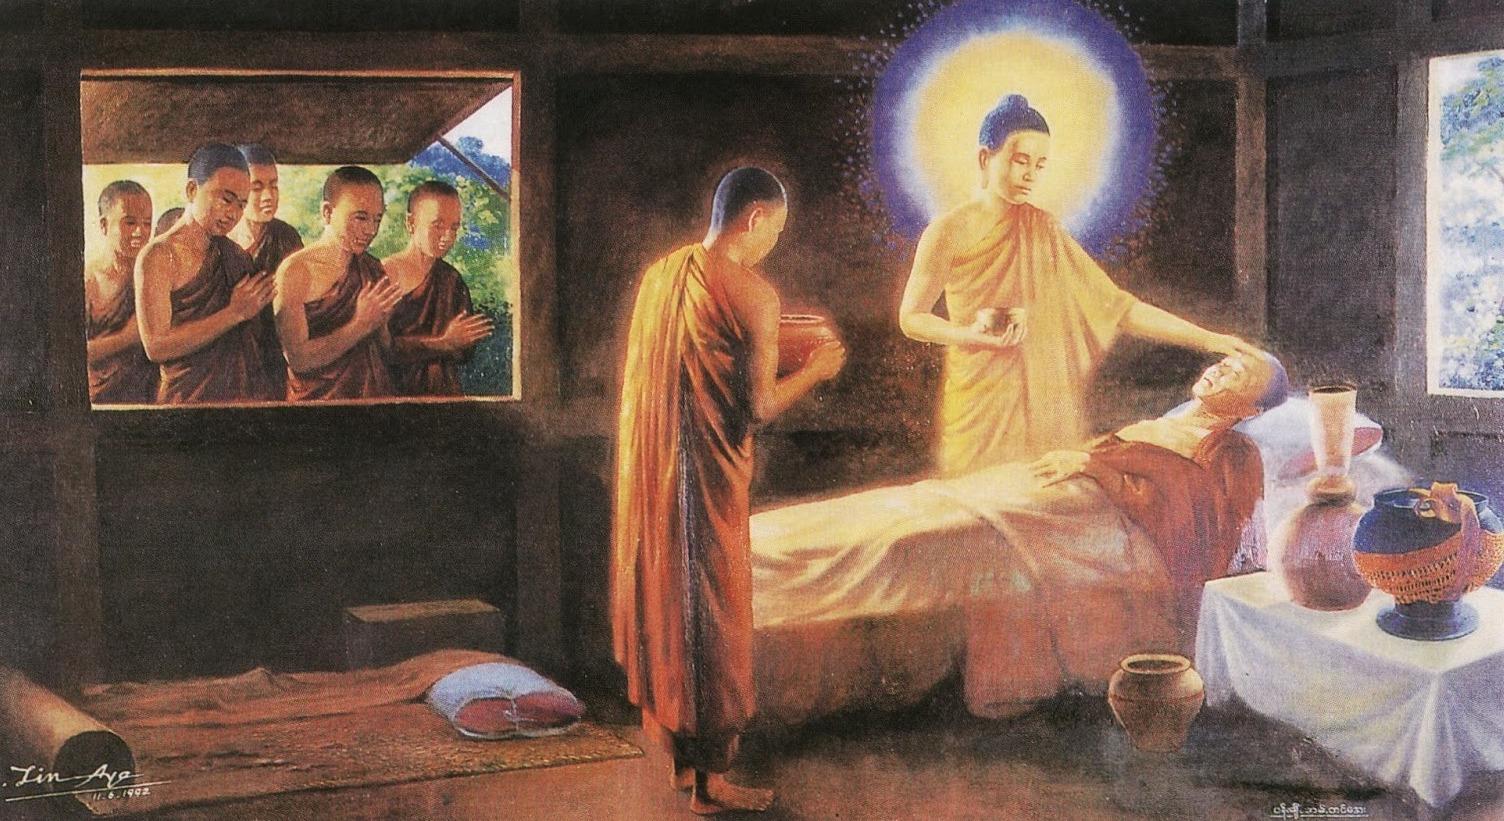 ho niem cho nguoi lam chung the nao la dung cach va loi ich nhat 60981050058b5